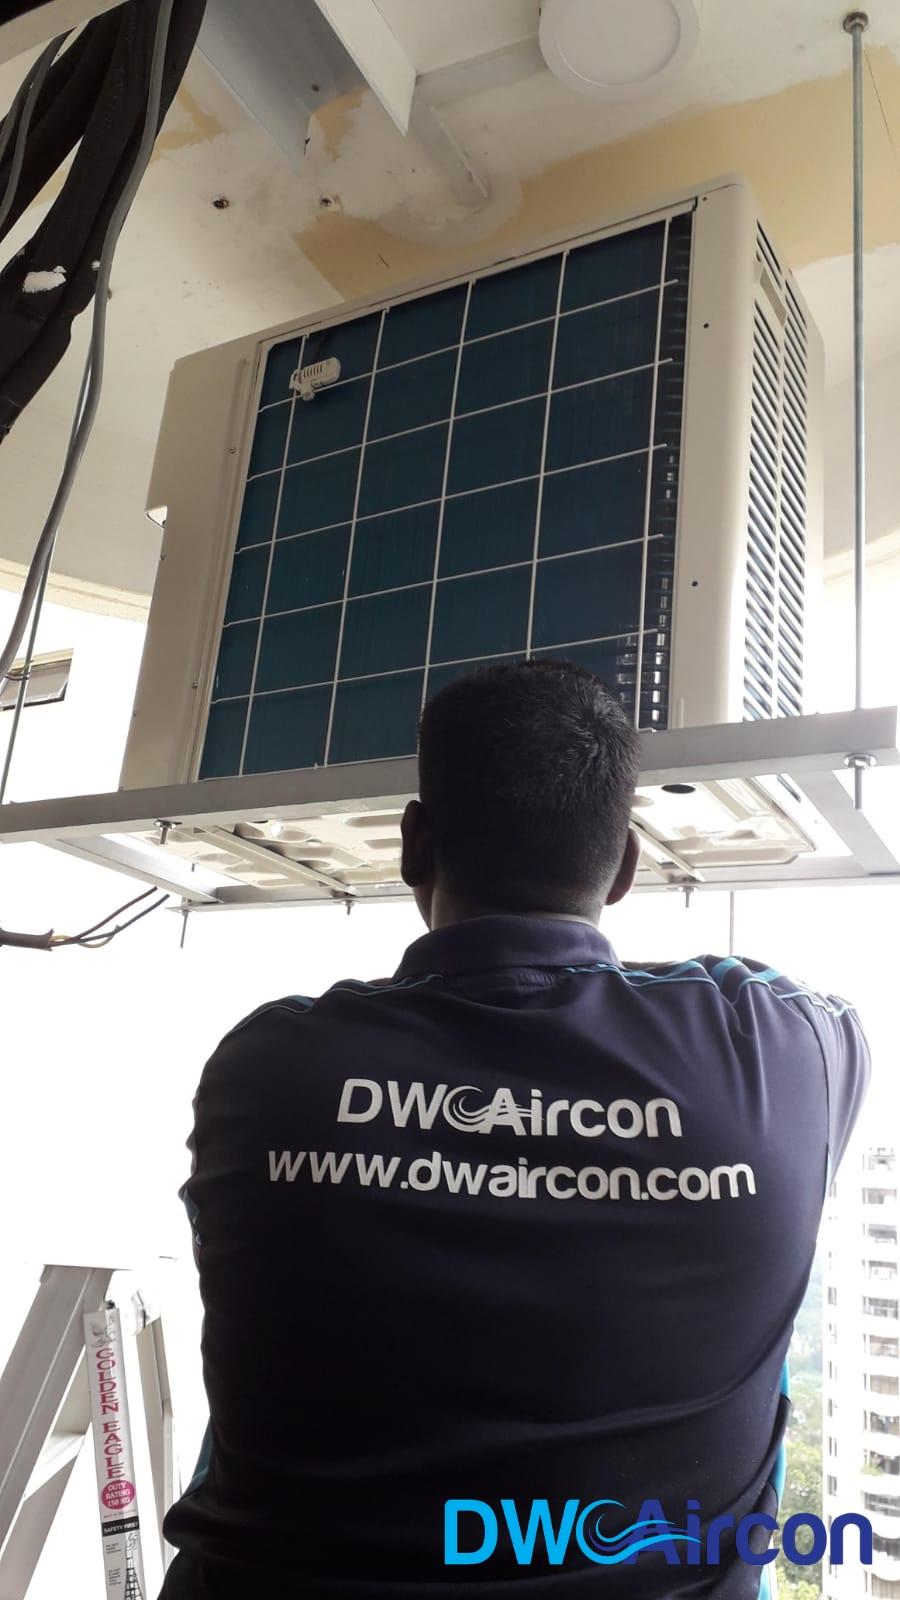 Condenser Aircon Installation DW Aircon Servicing Singapore Condo Cashew Road 1